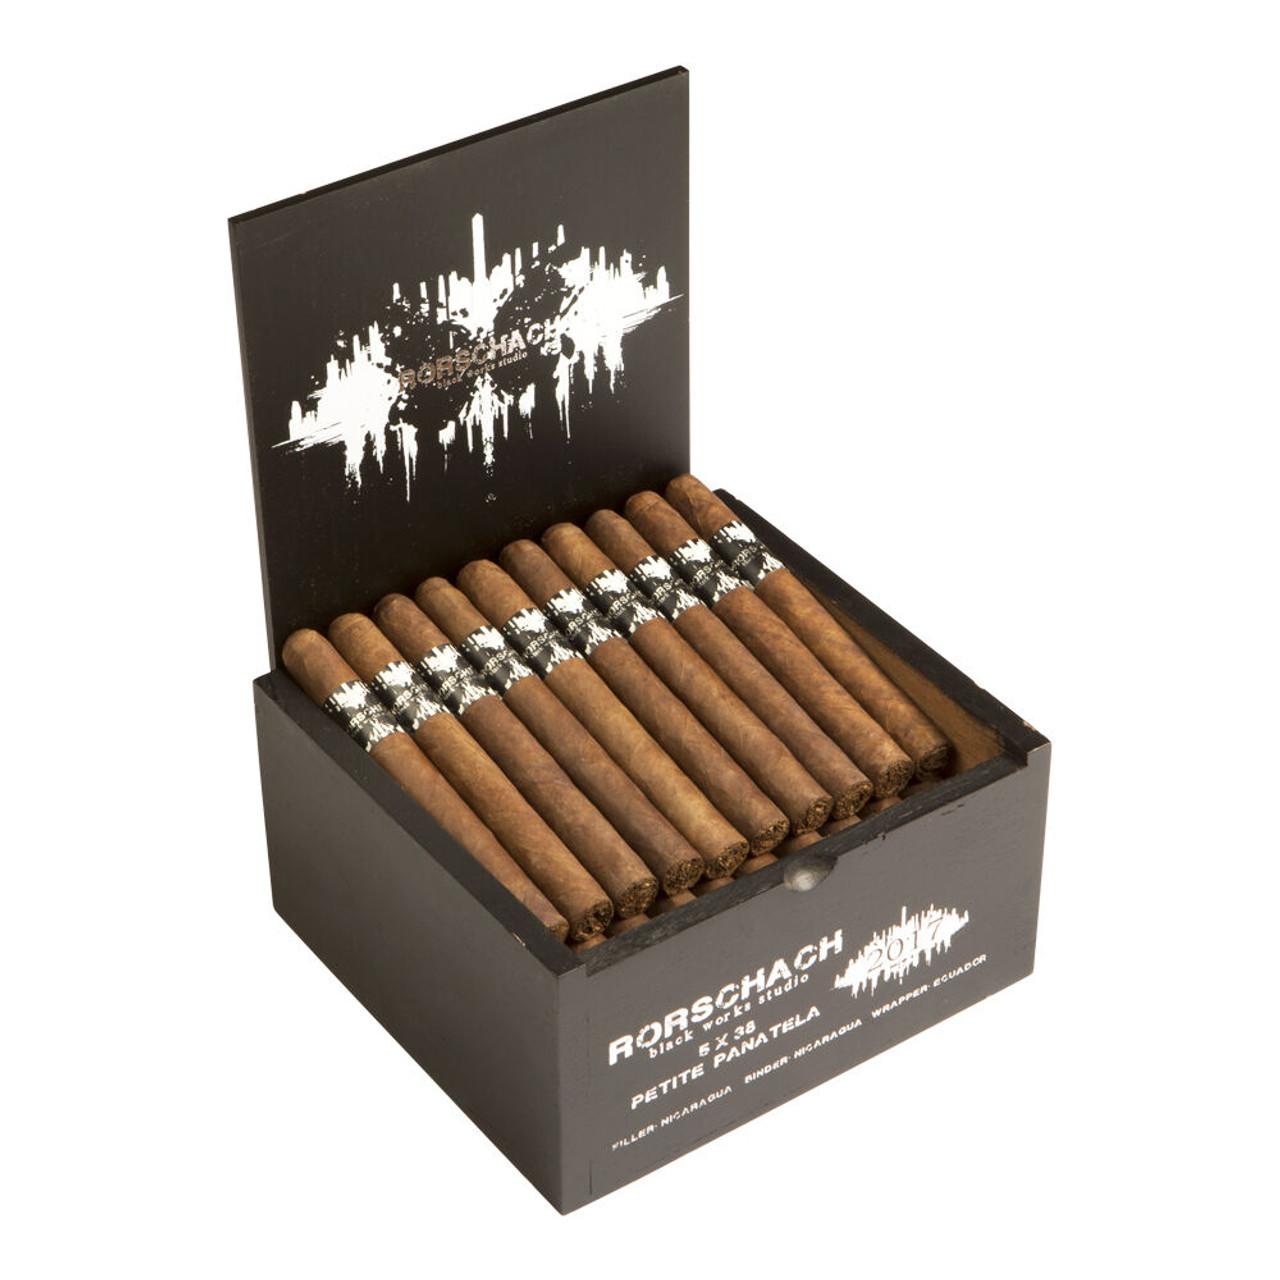 Black Works Studio Rorschach Petit Panatela Cigars - 5 x 38 (Box of 50)